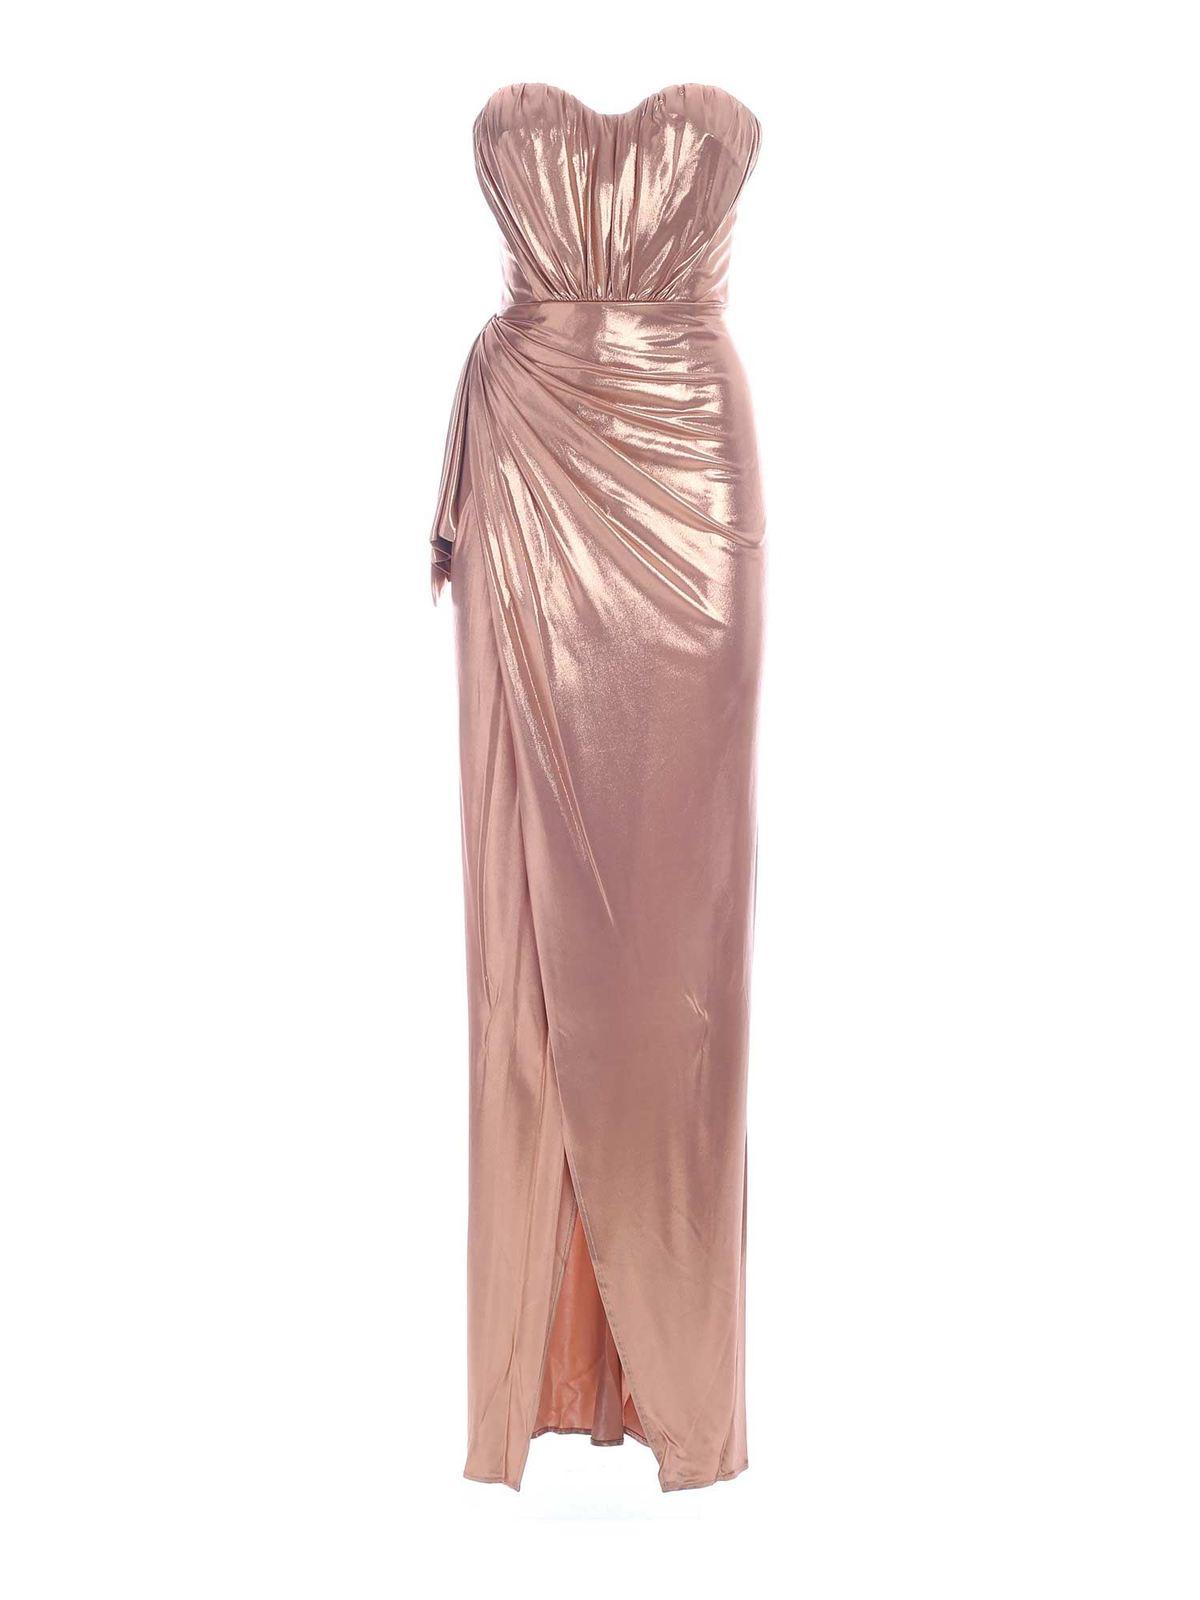 Elisabetta Franchi RIBBON LONG DRESS IN PINK